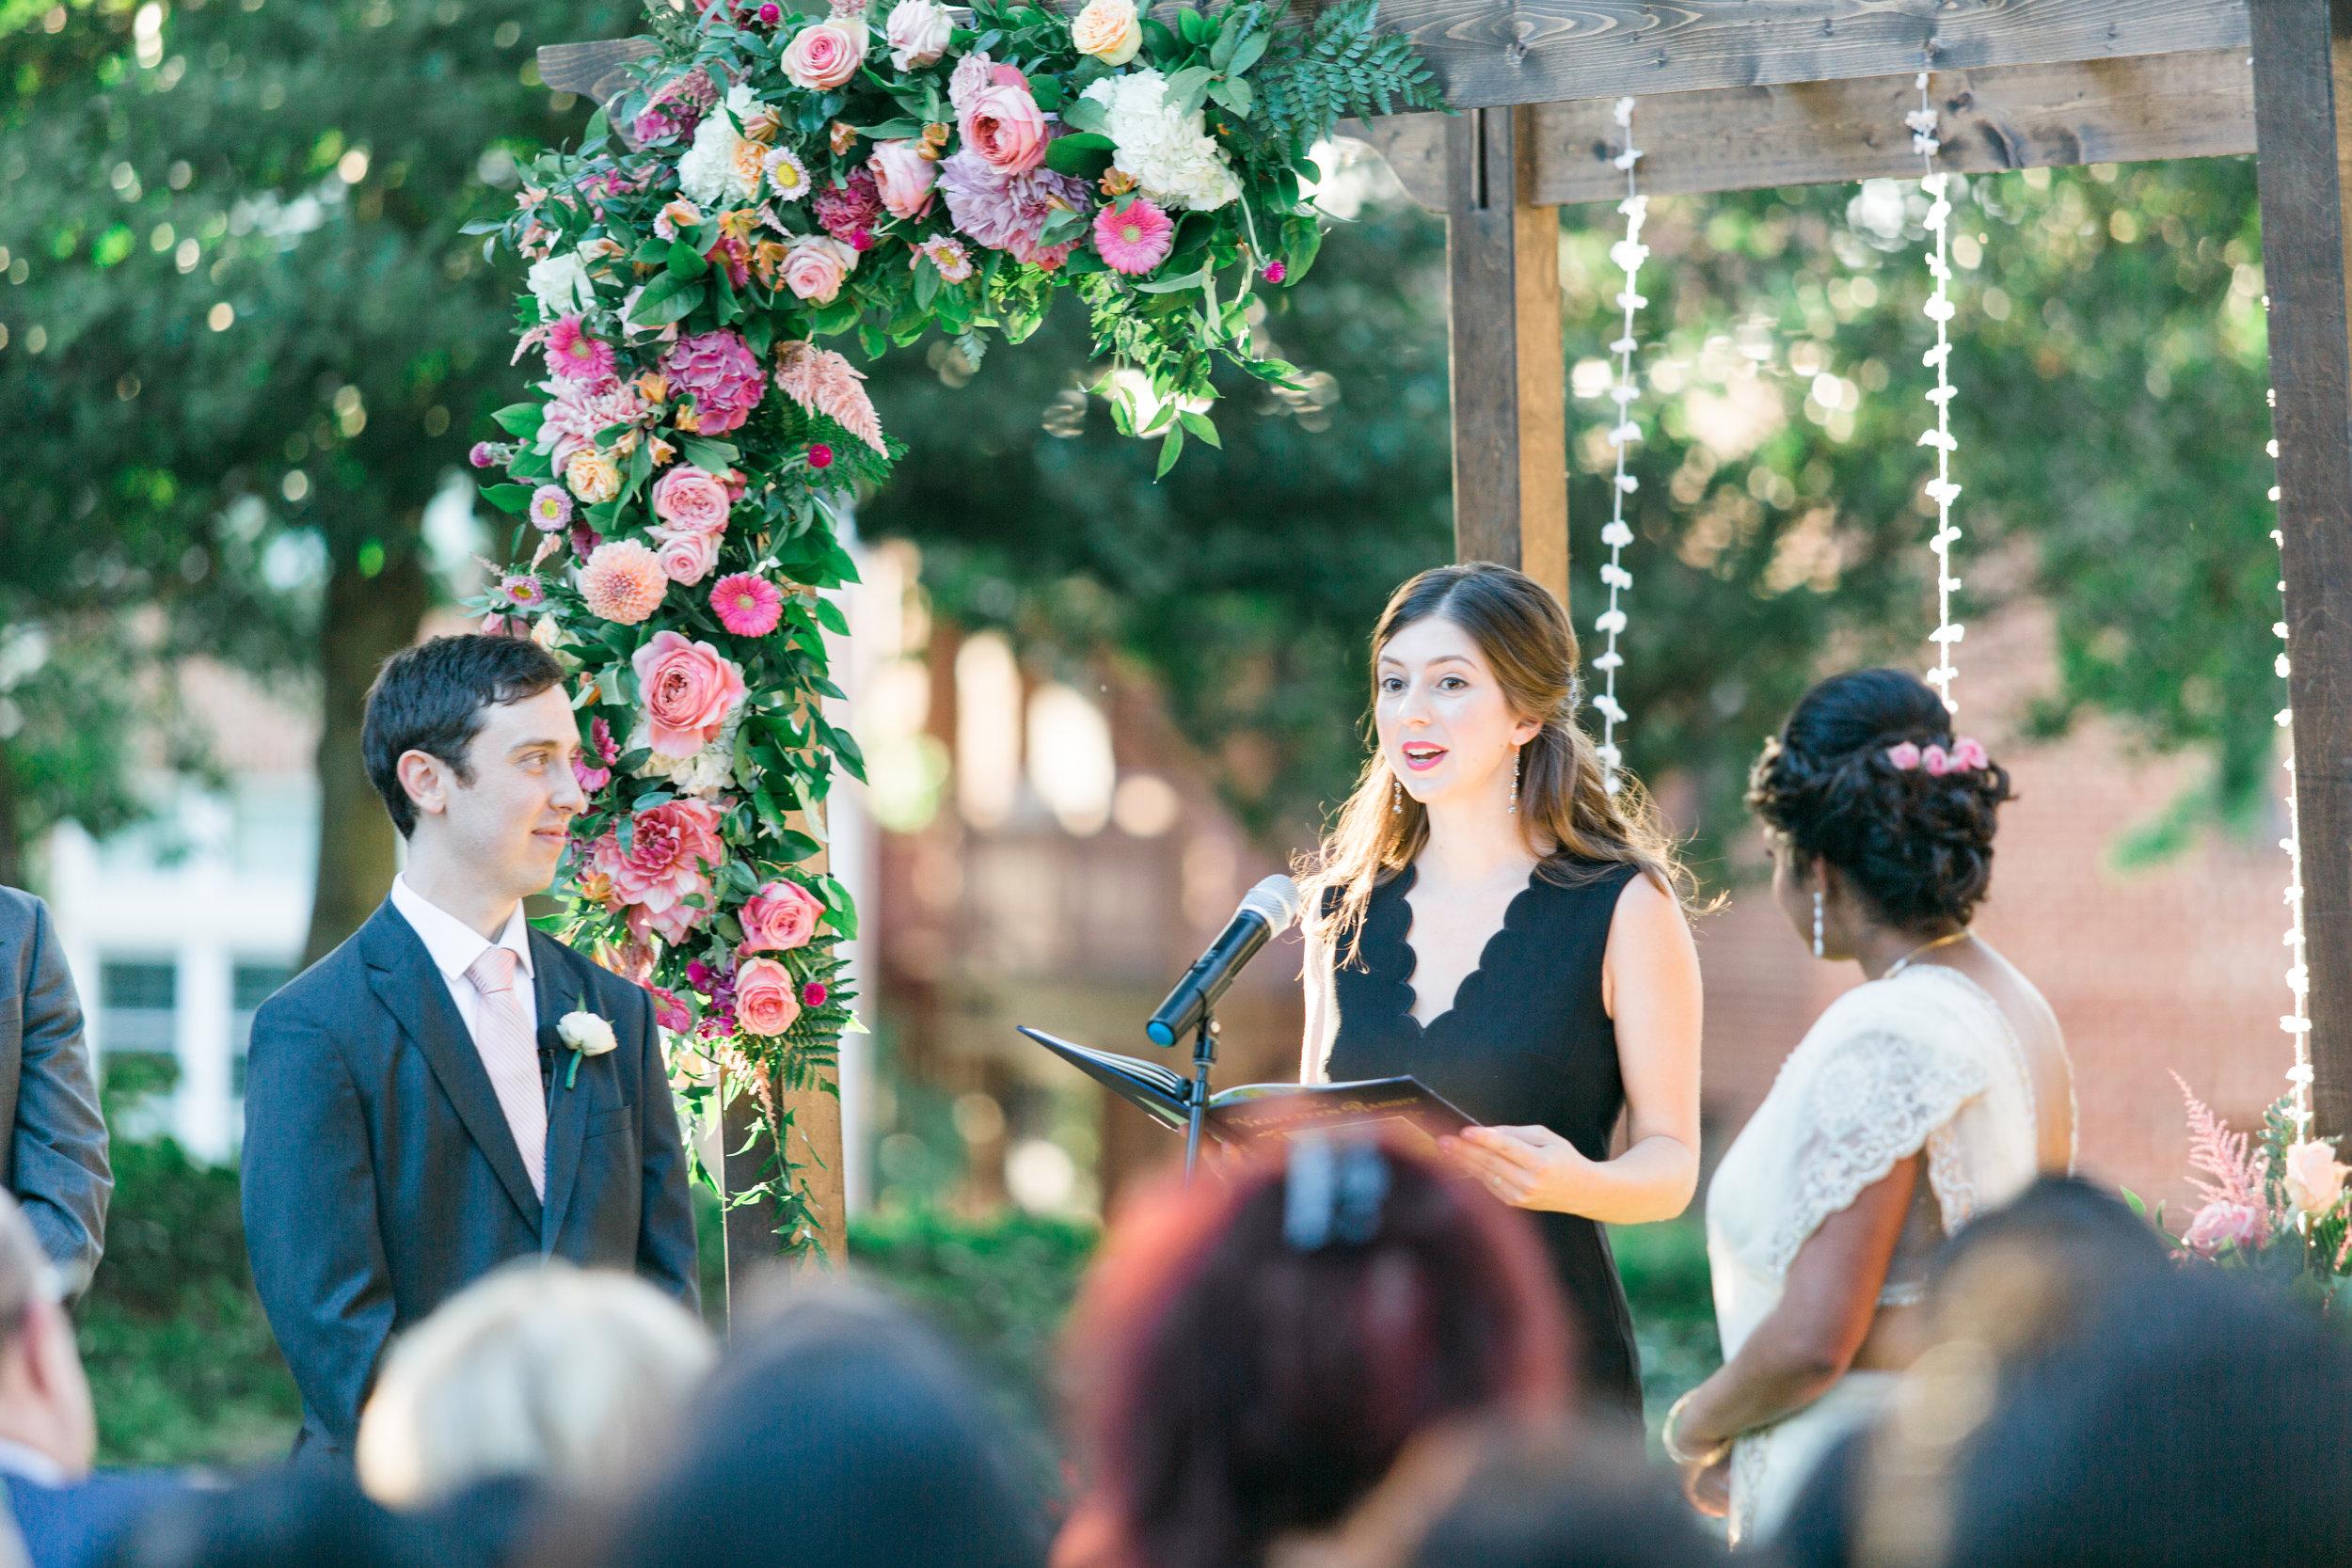 catherineannphotography-wedding-92317-sitaragordon-0520.jpg